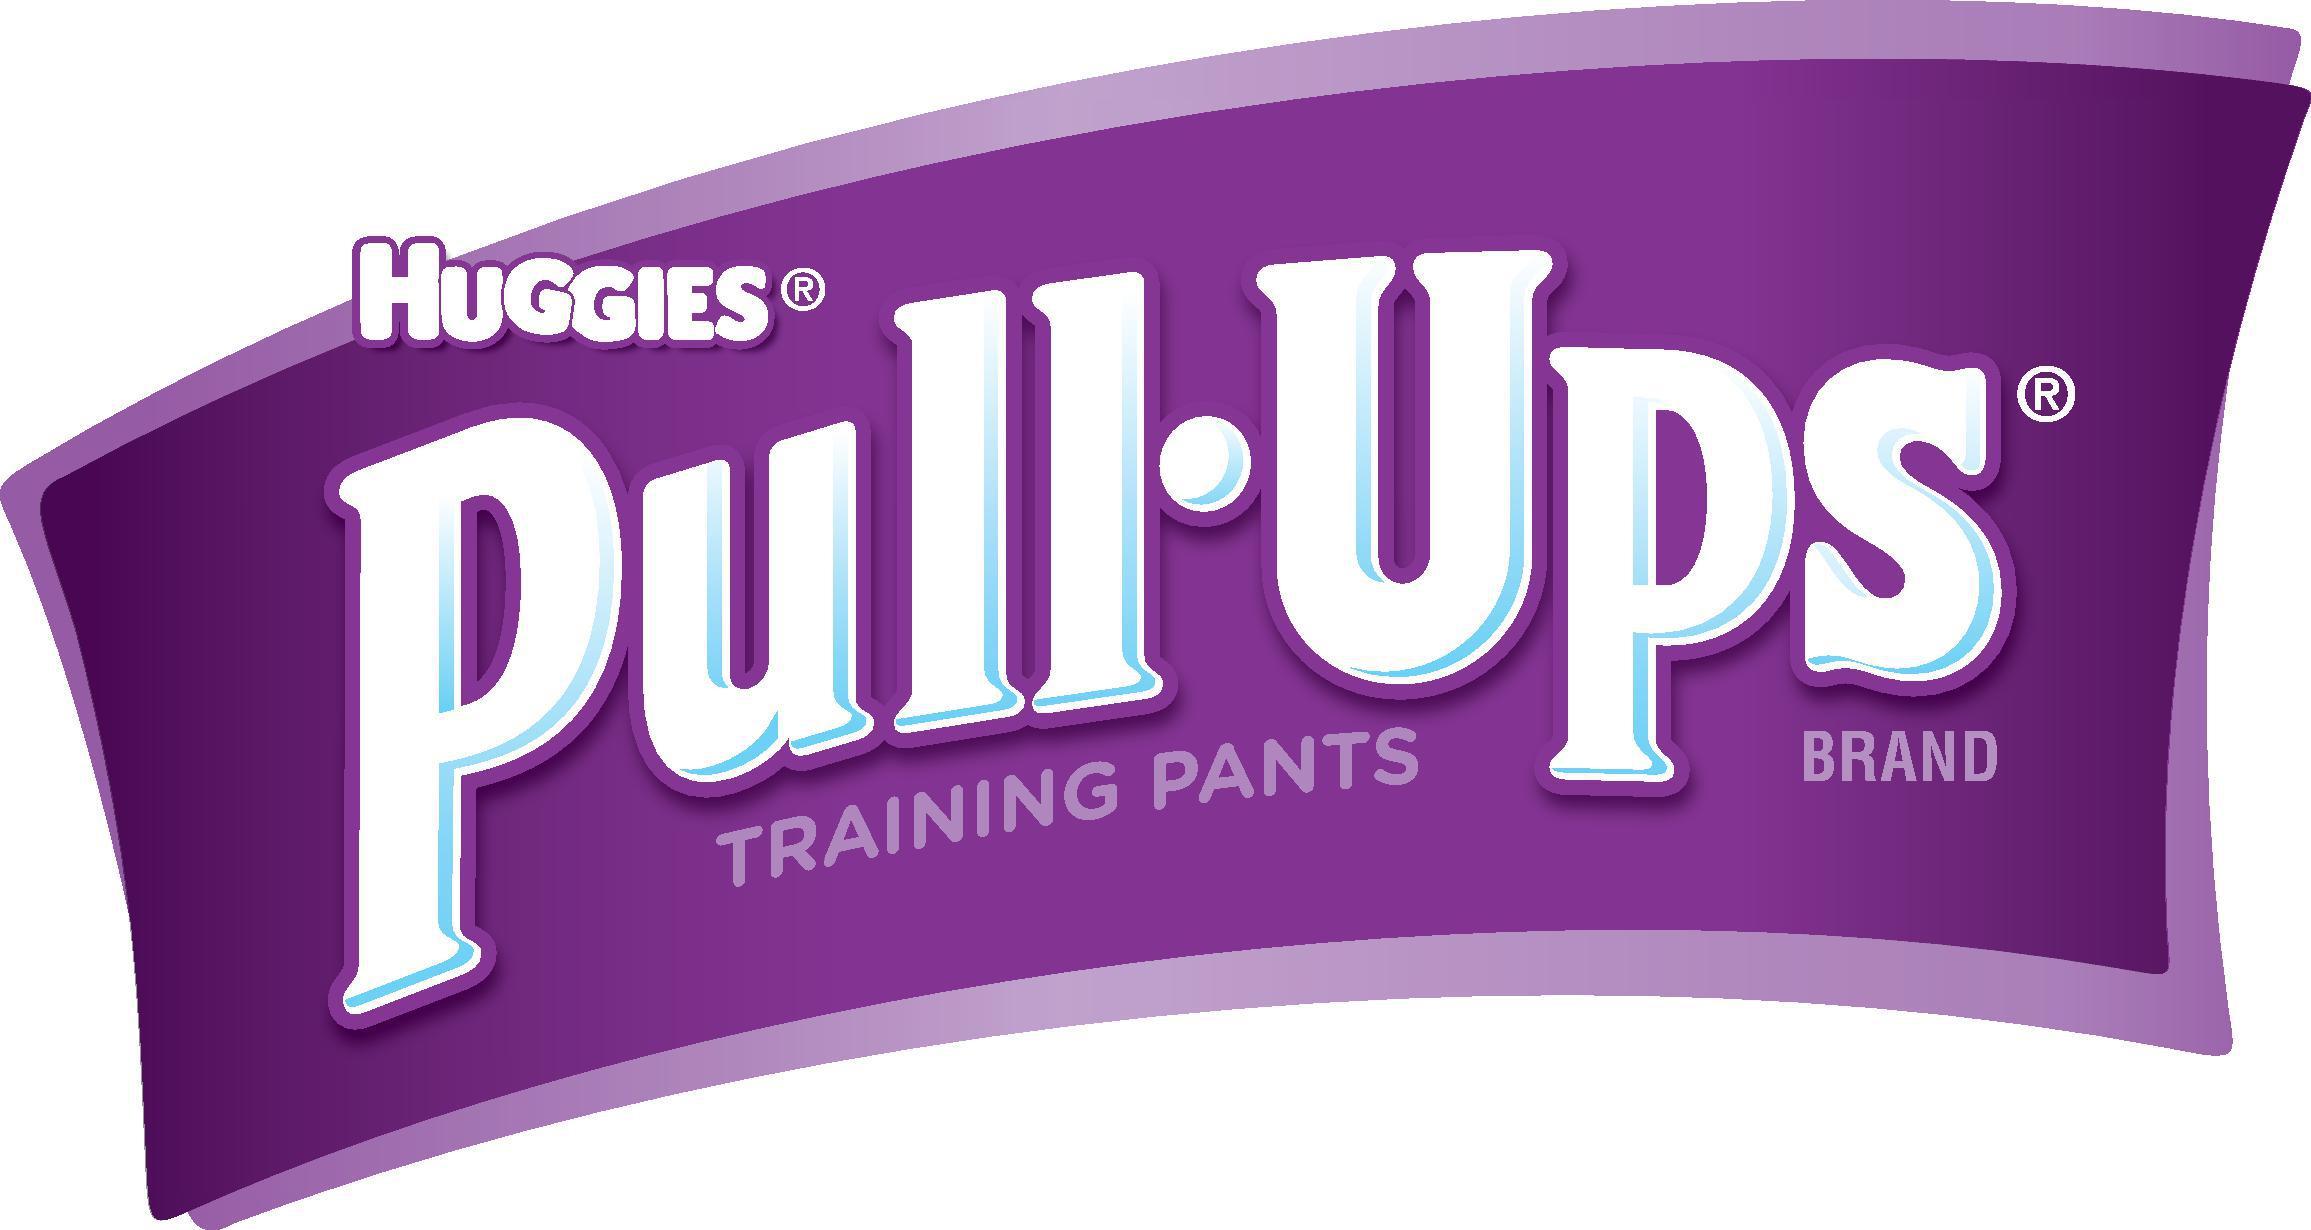 Huggies Pull Ups Training Pants Printable Coupon + Potty Training - Free Printable Coupons For Huggies Pull Ups